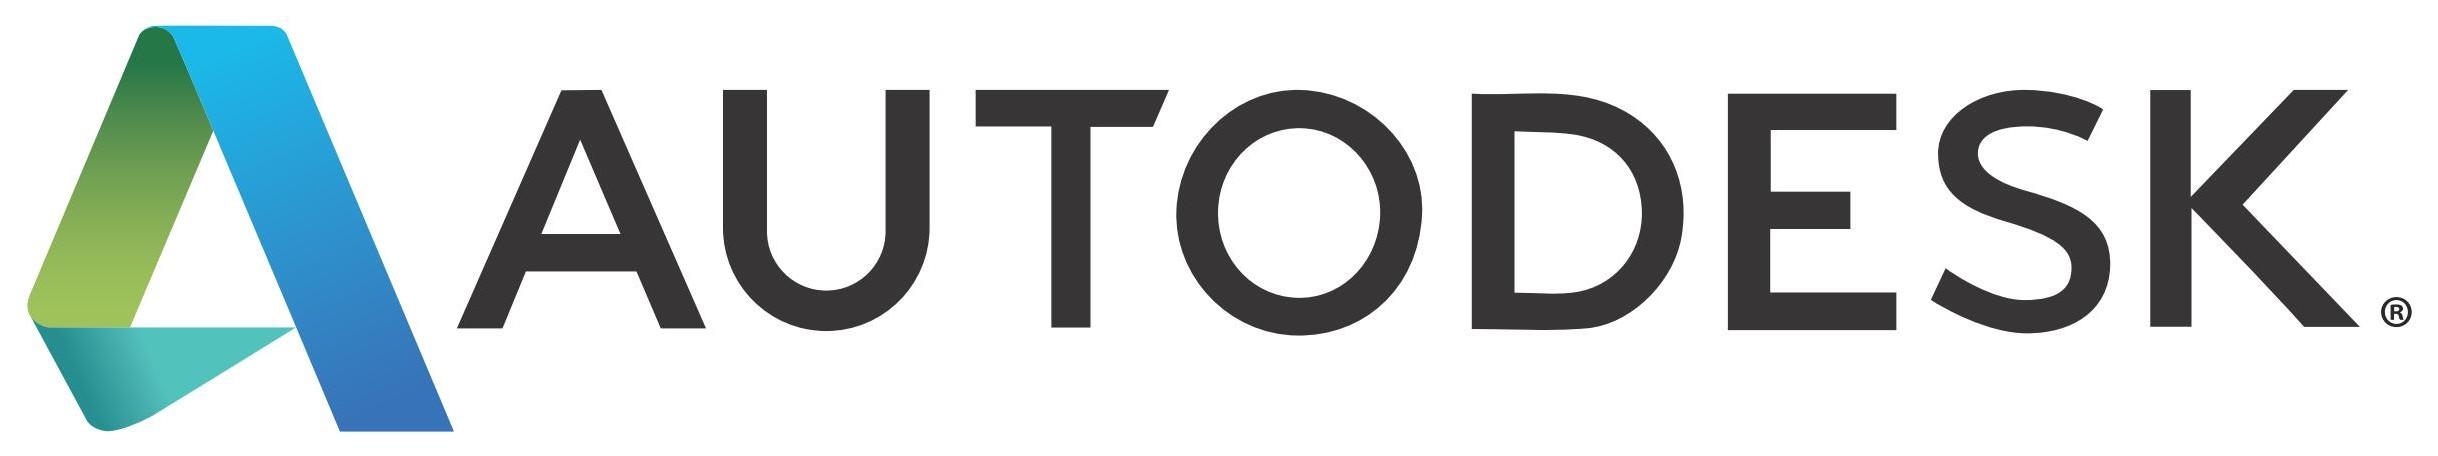 Autodesk-logo - Autodesk Vector PNG